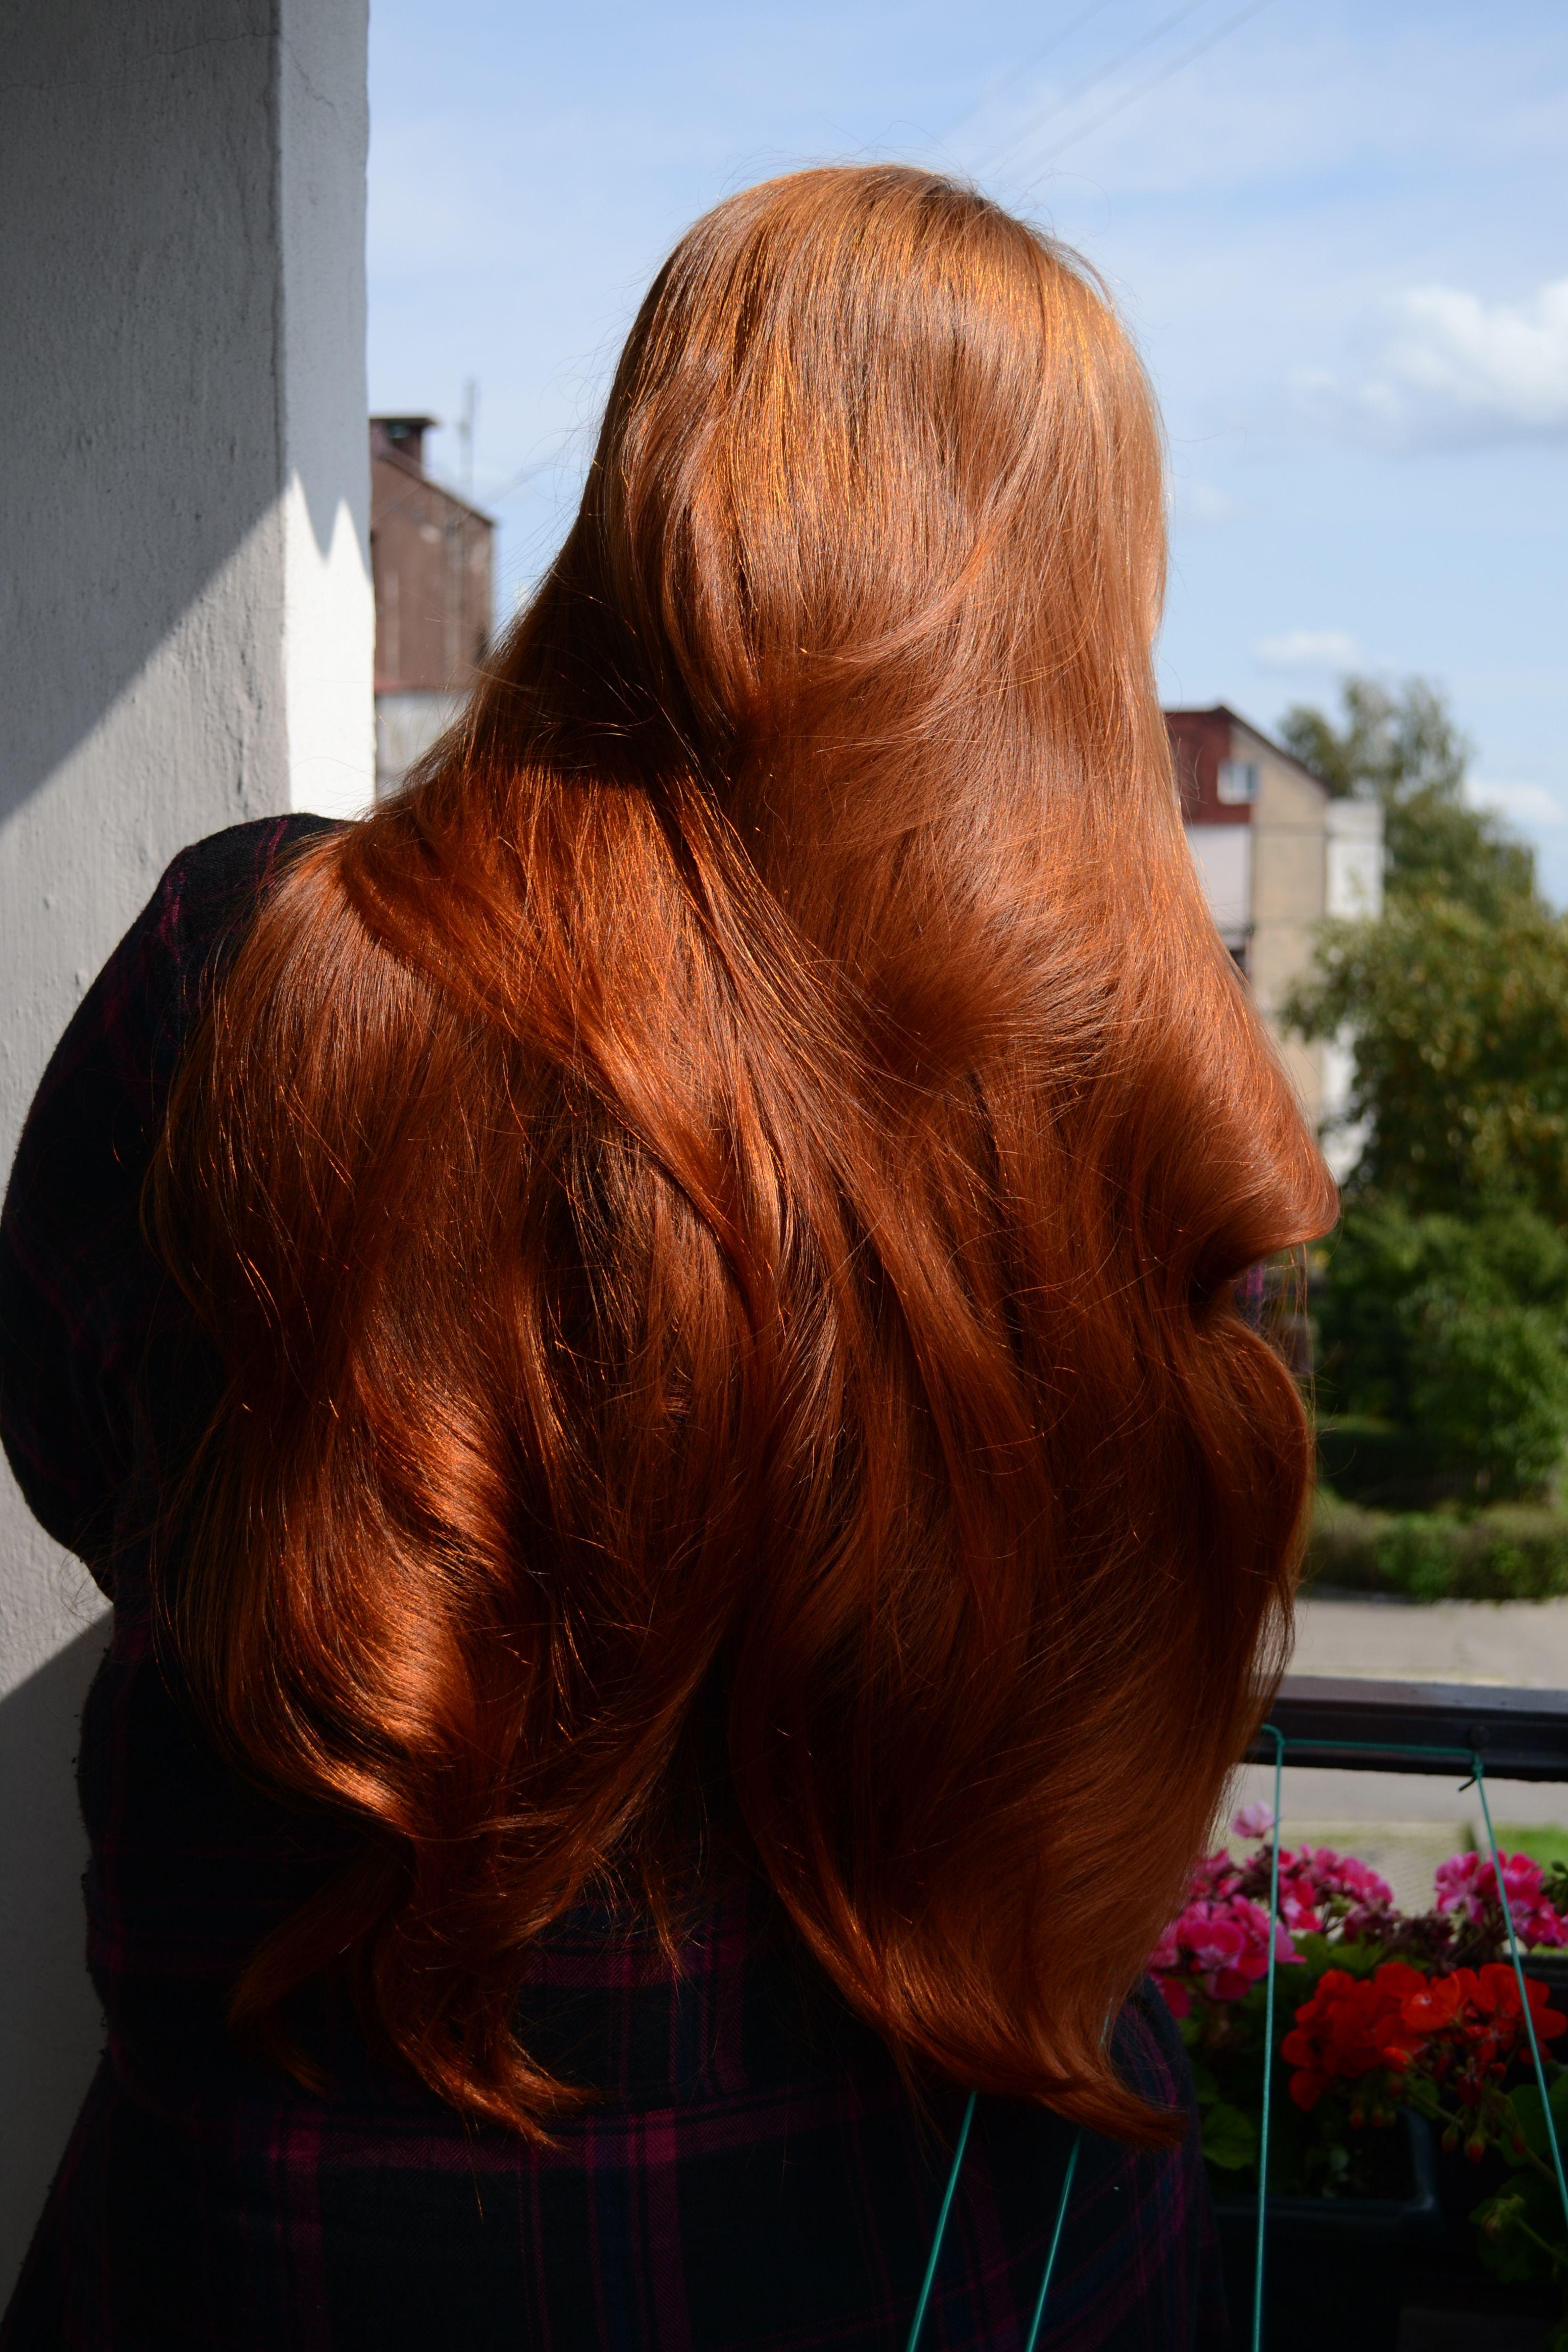 Pin by Yuliana Maciel on Hairstyles  Pinterest  Hair coloring